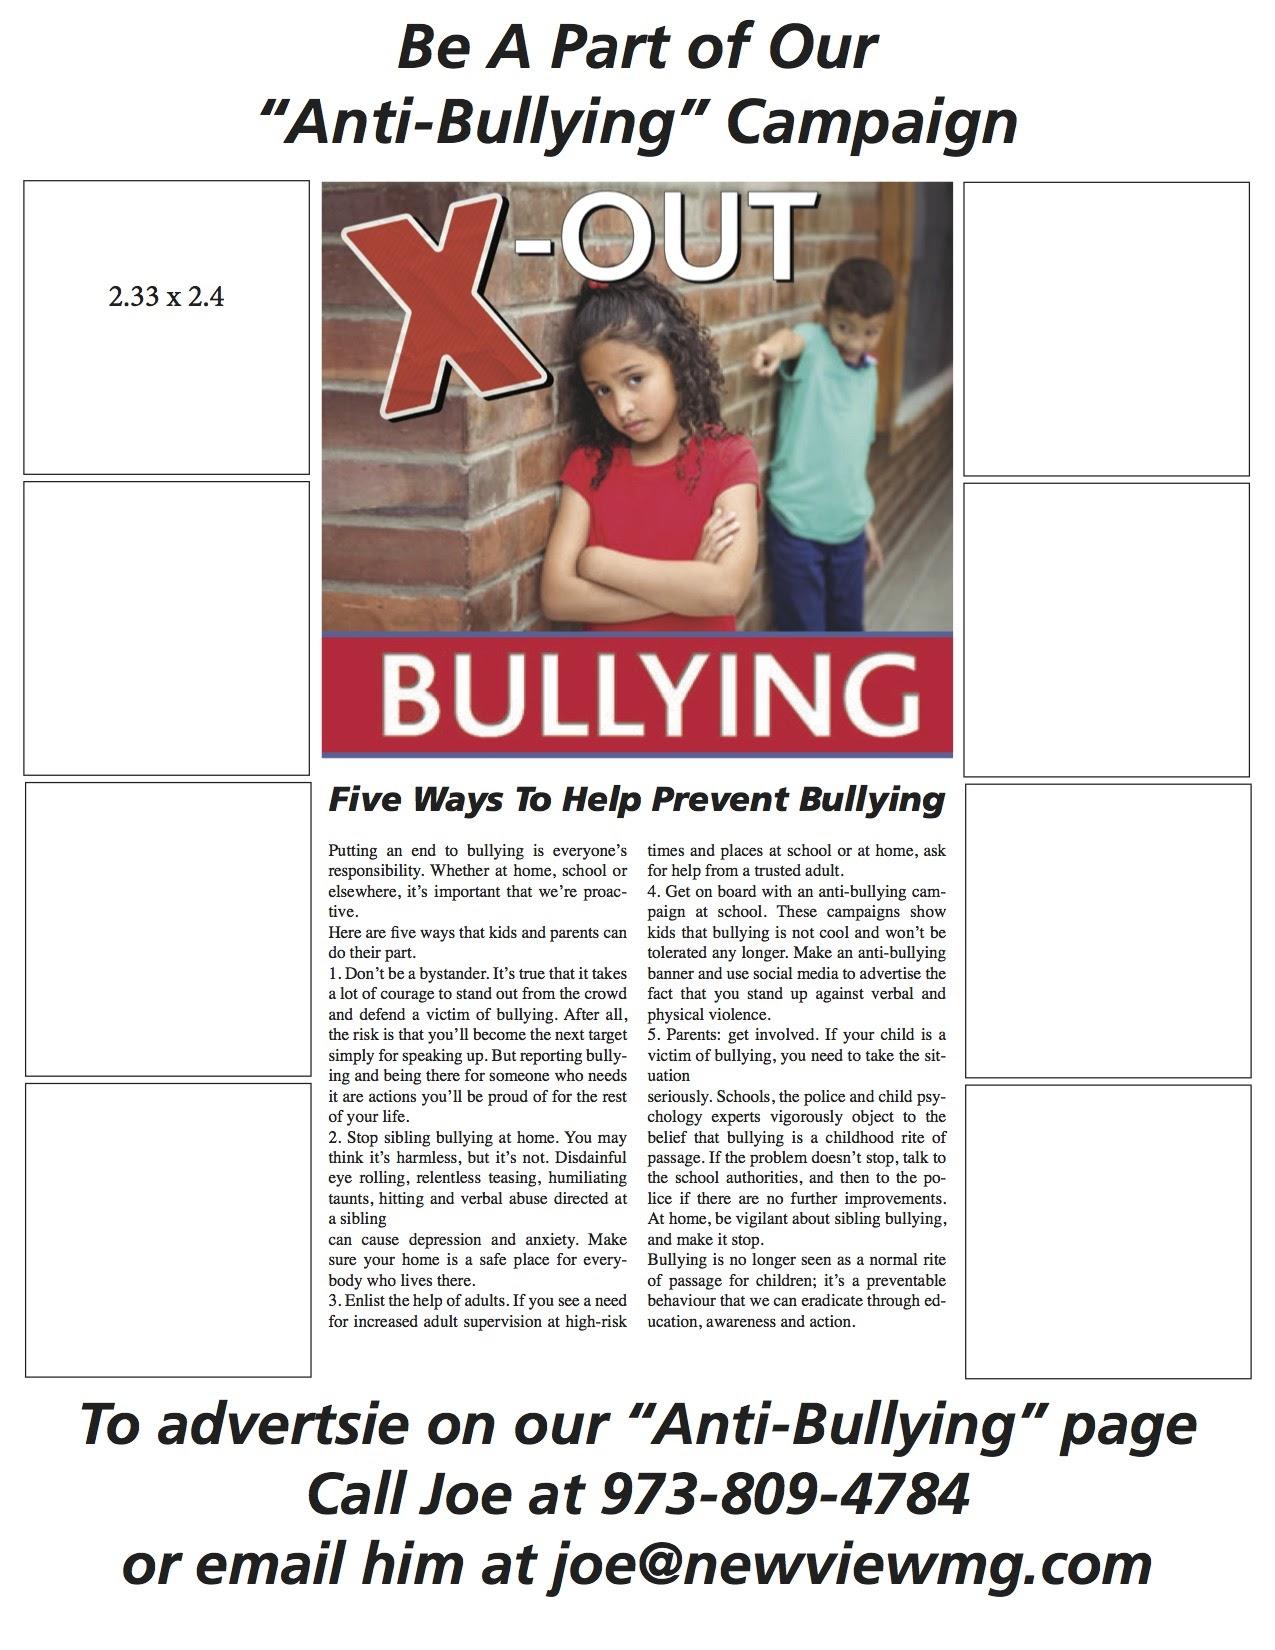 Bullying flier – joe